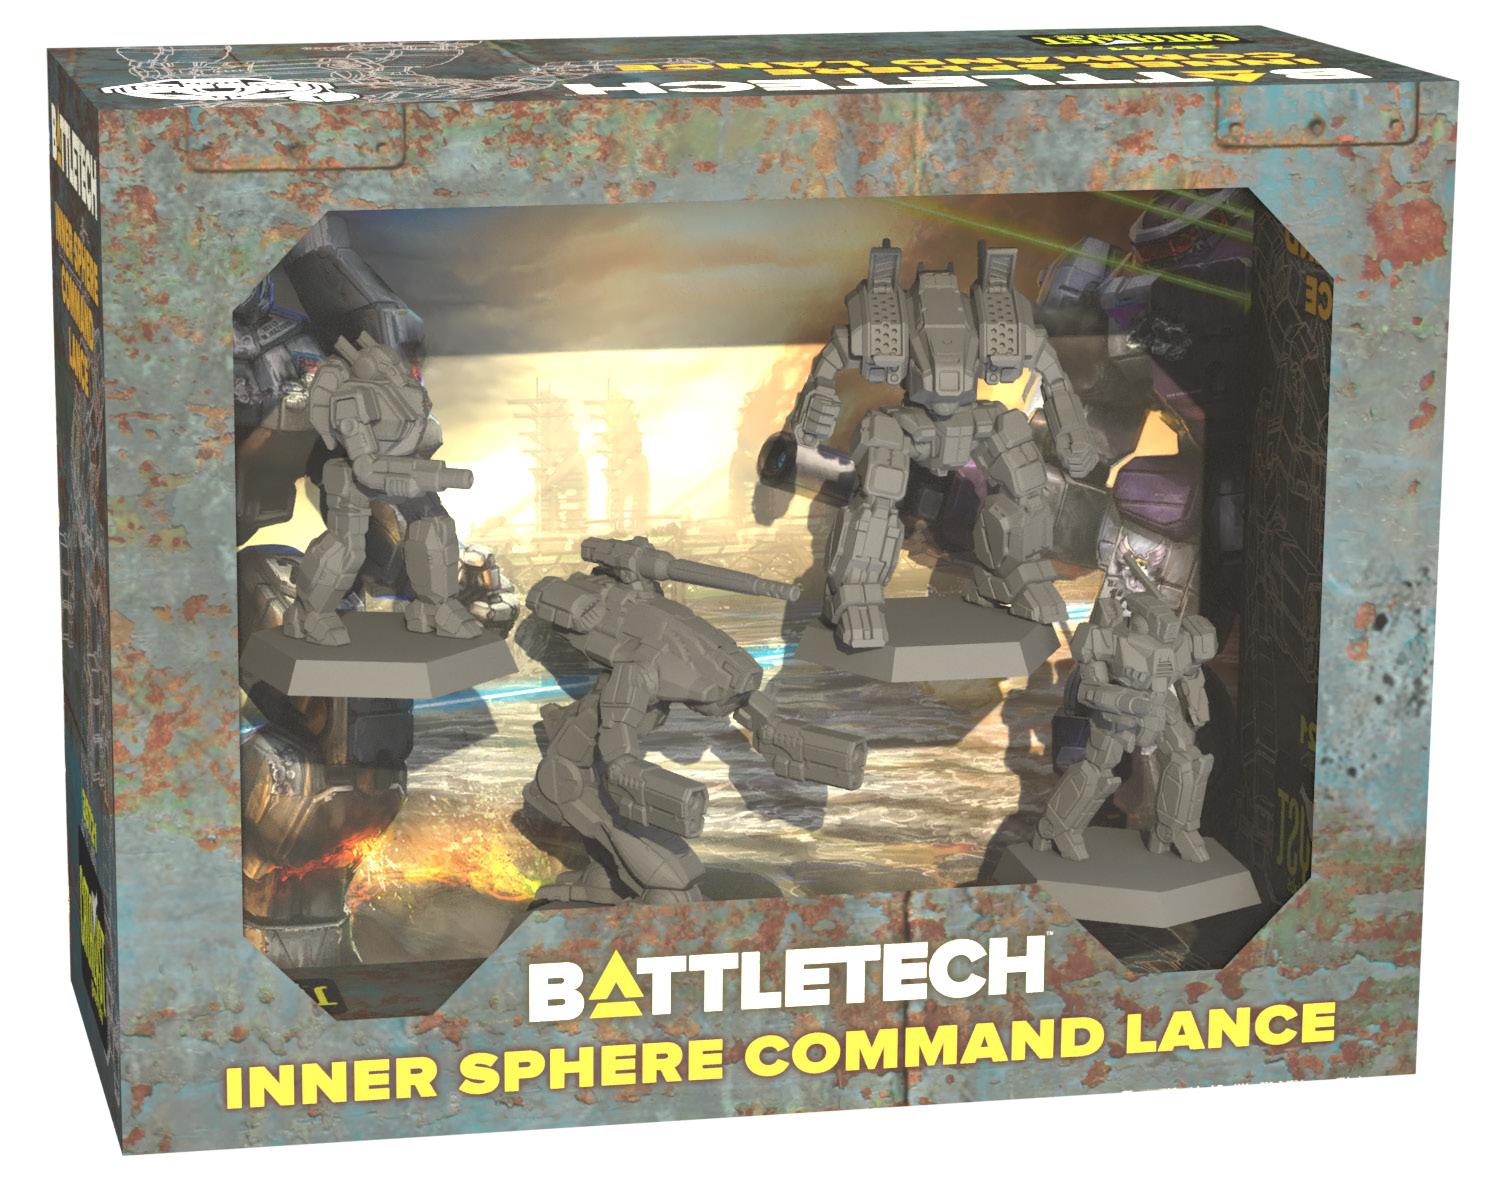 Battletech: Miniature Force Pack - Inner Sphere Command Lance